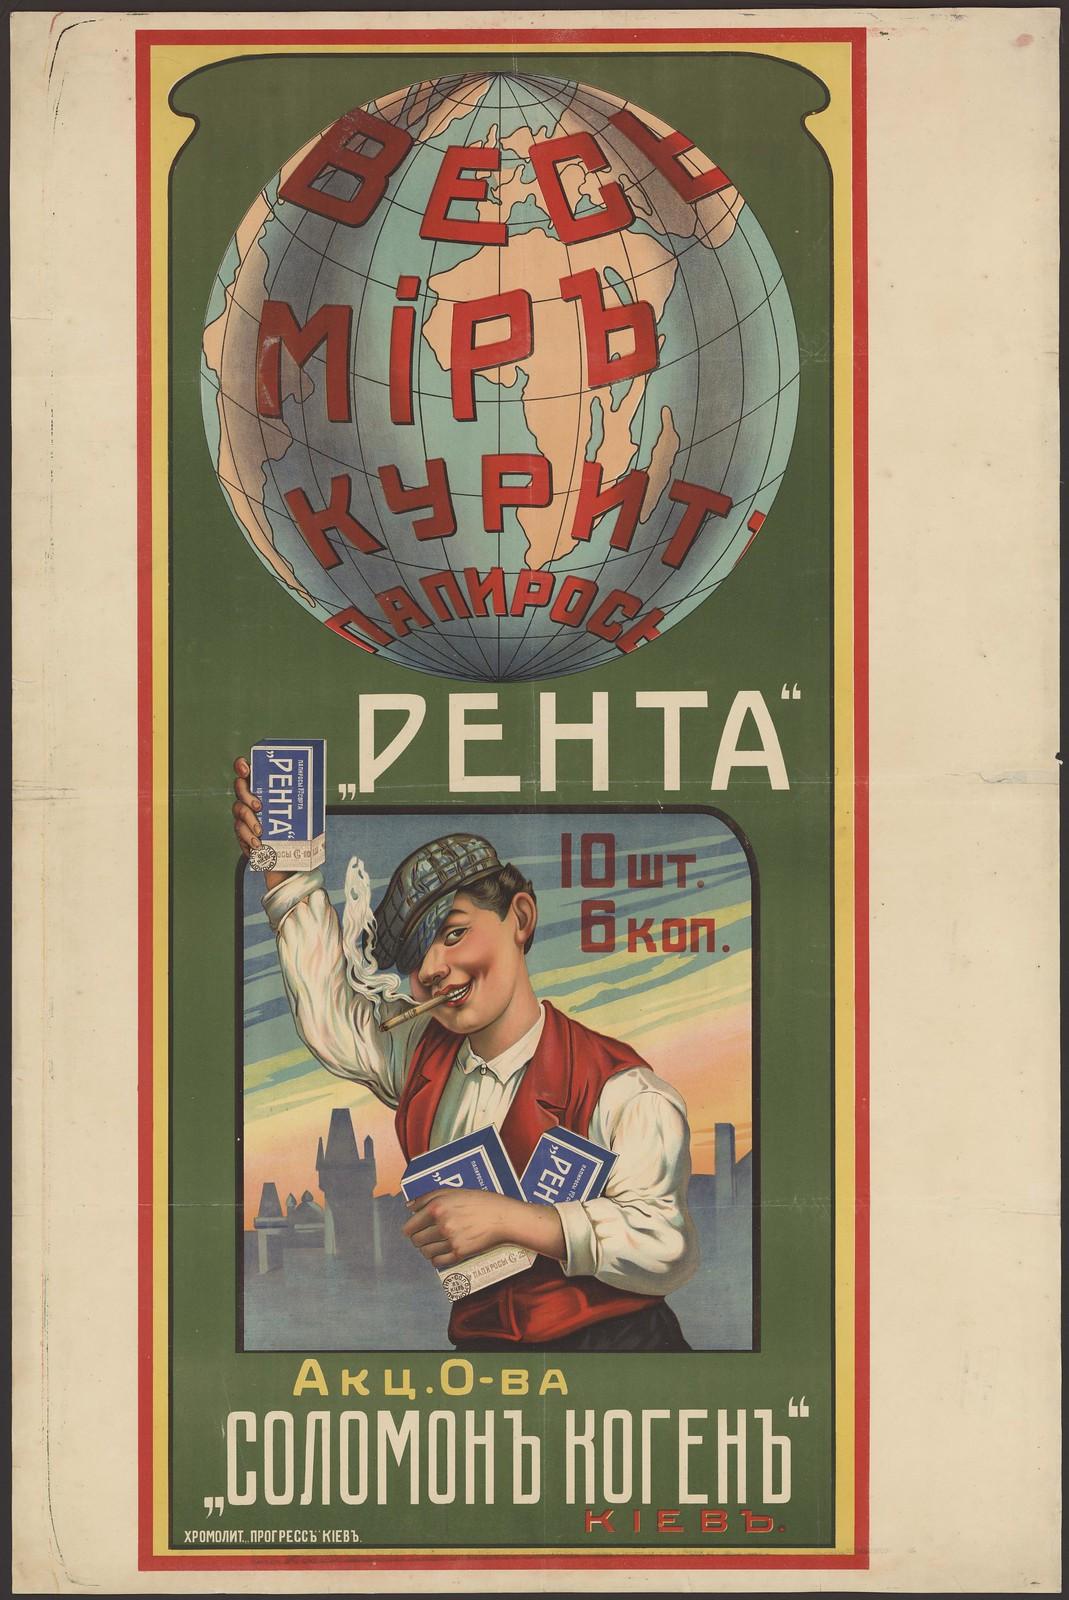 Весь мир курит папиросы «Рента» Акц. О-ва «Соломон Коген». Киев